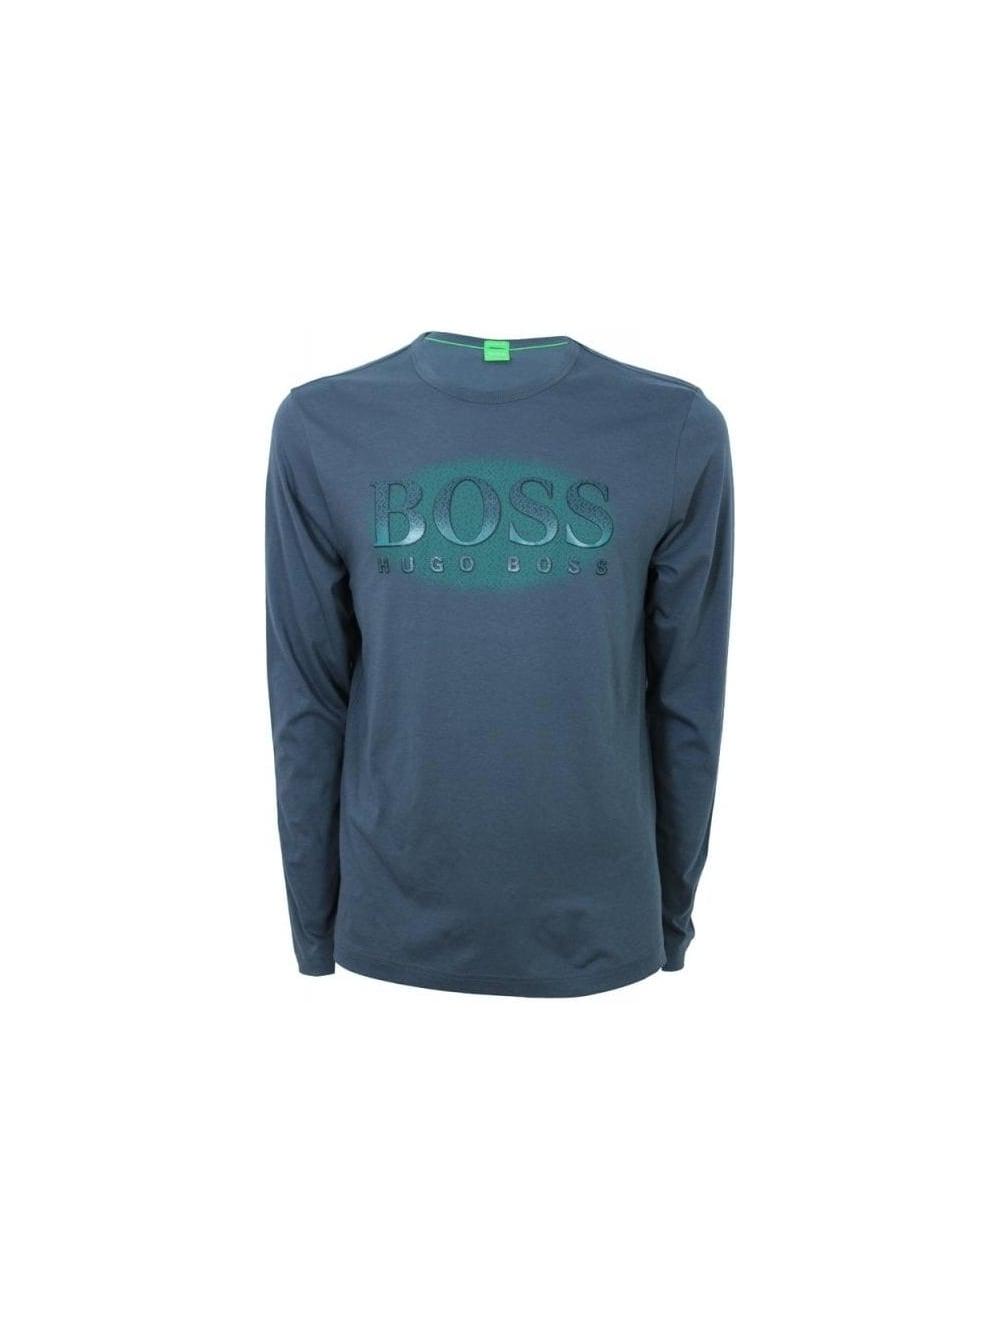 478bff44a Boss Green Togn 2 Long Sleeve T.Shirt in Dark Grey - Northern Threads